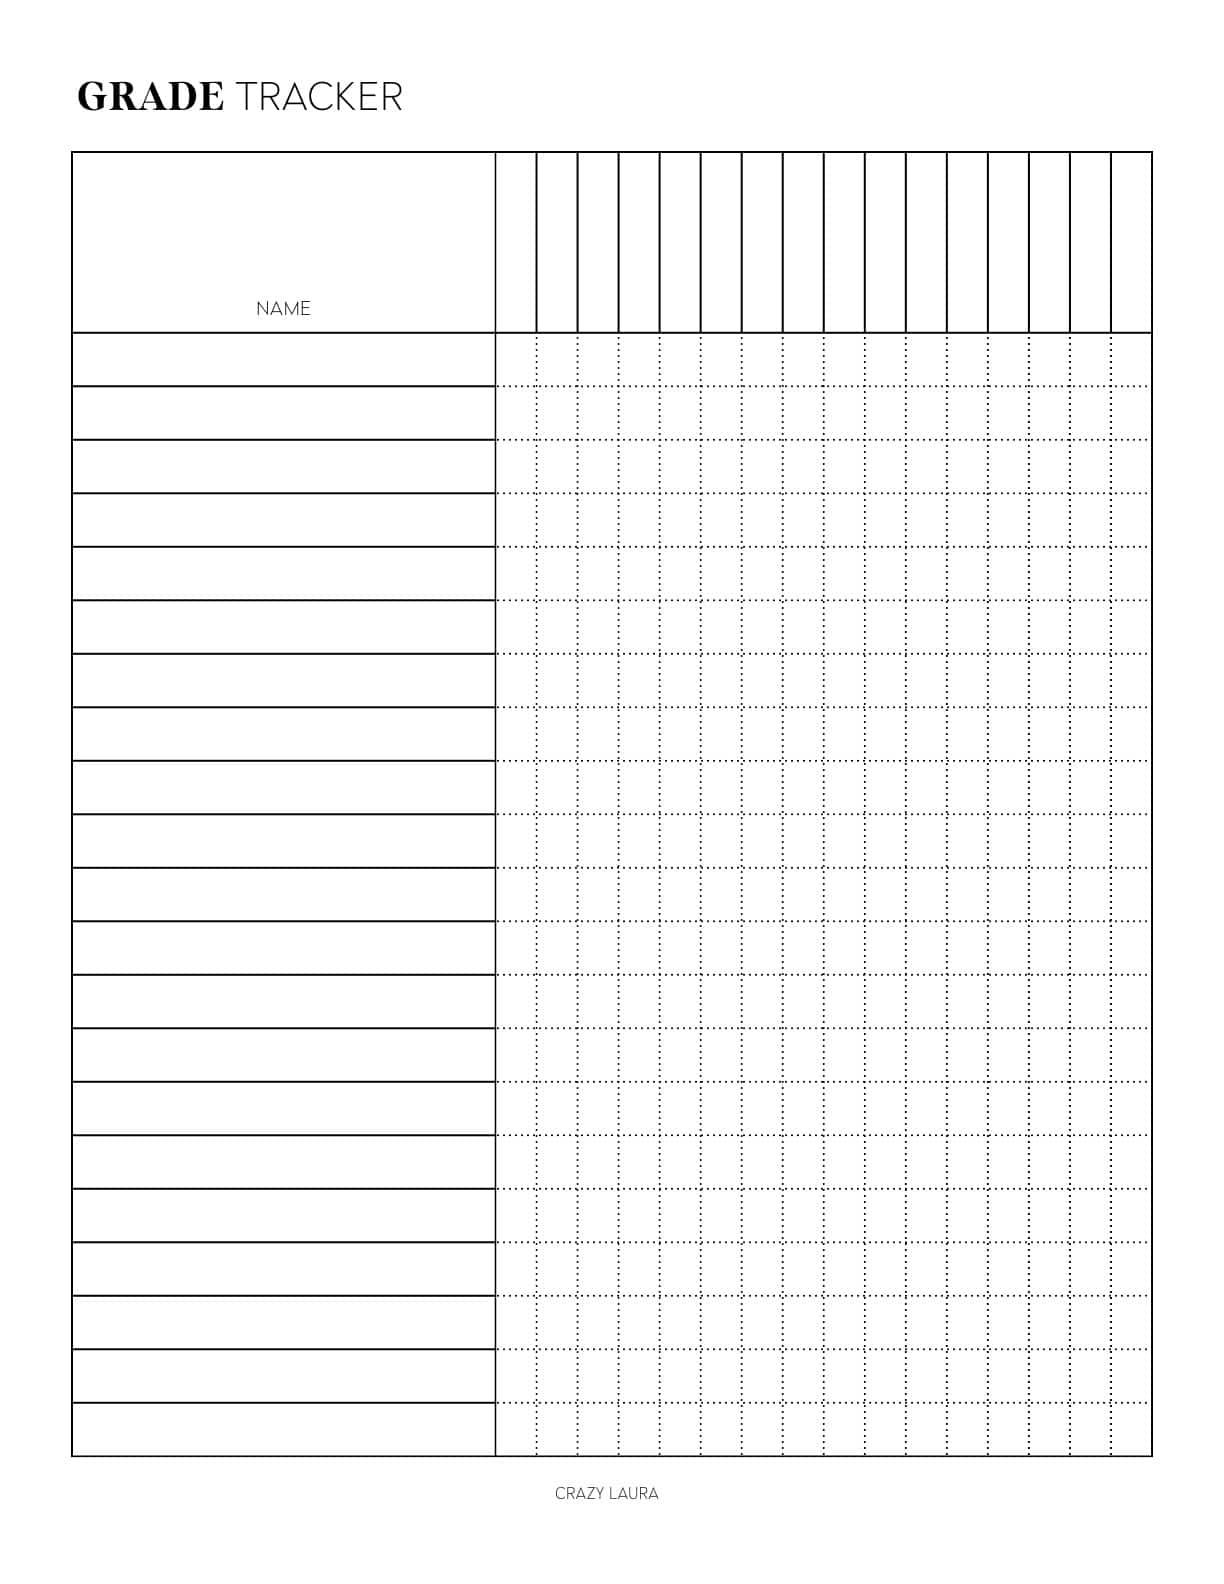 printable grade tracker for free